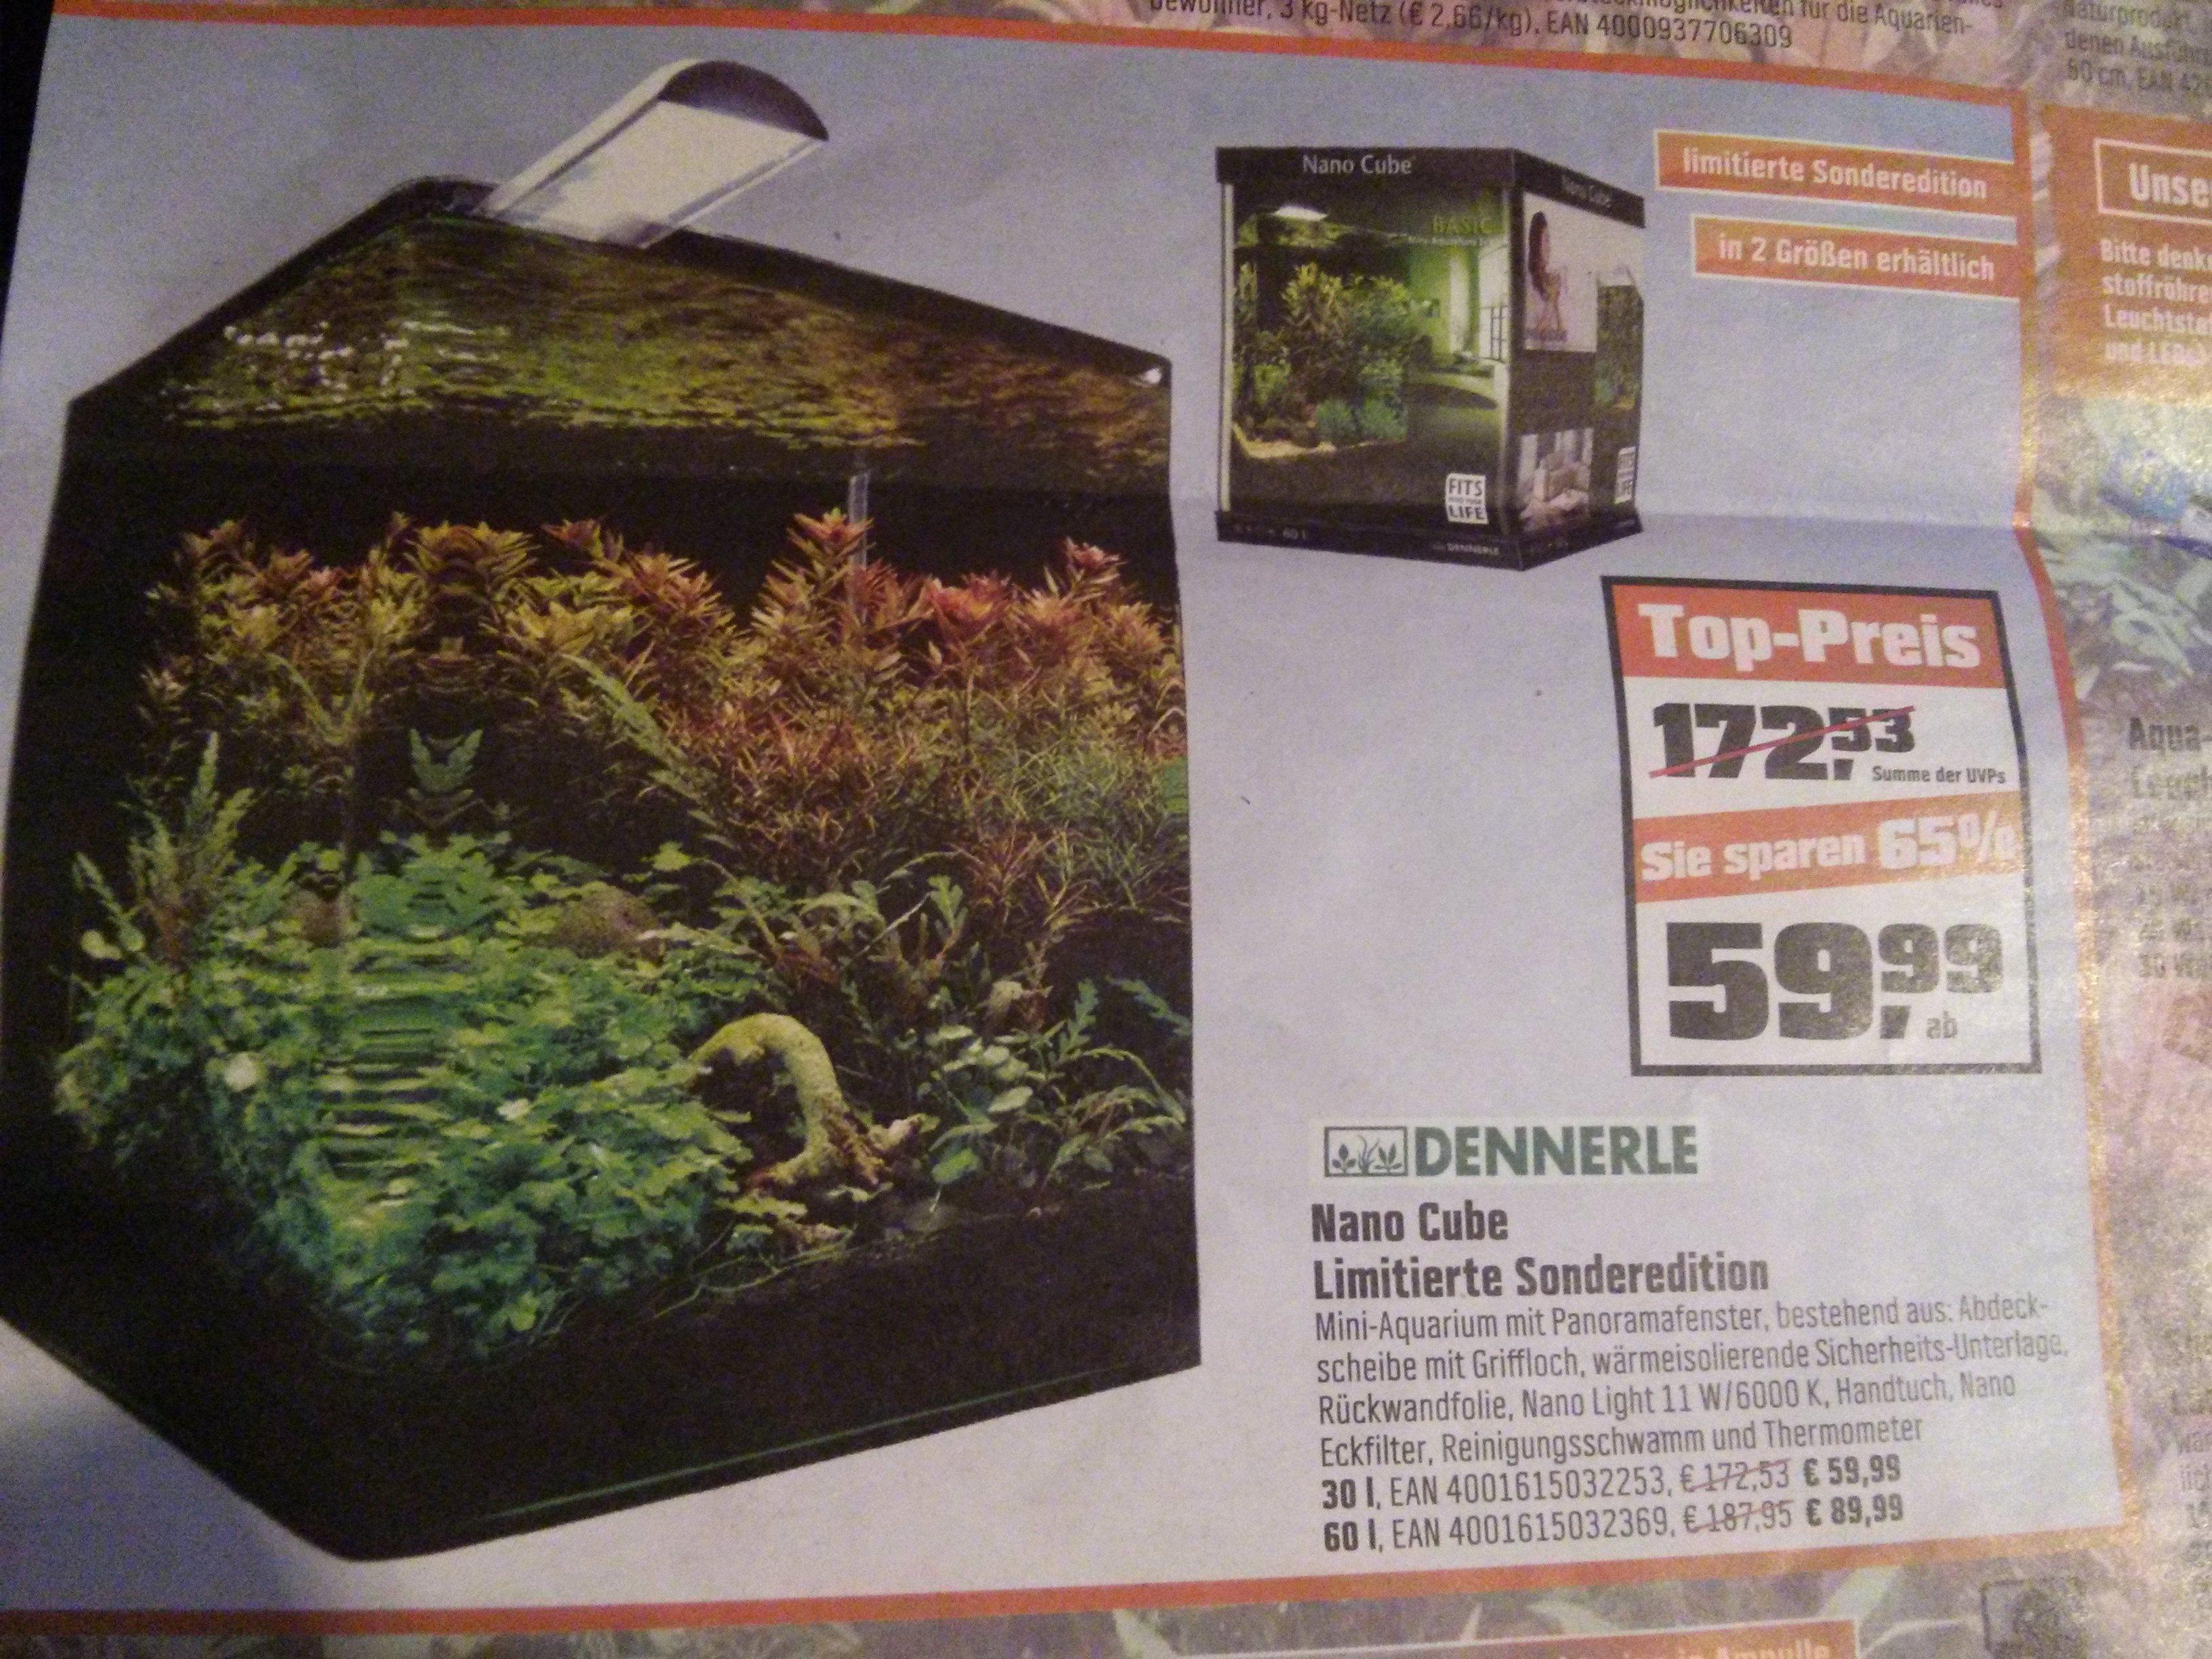 [Lokal Franken?] OBI - Dennerle Nano Cube Basic 30l für 59,99€